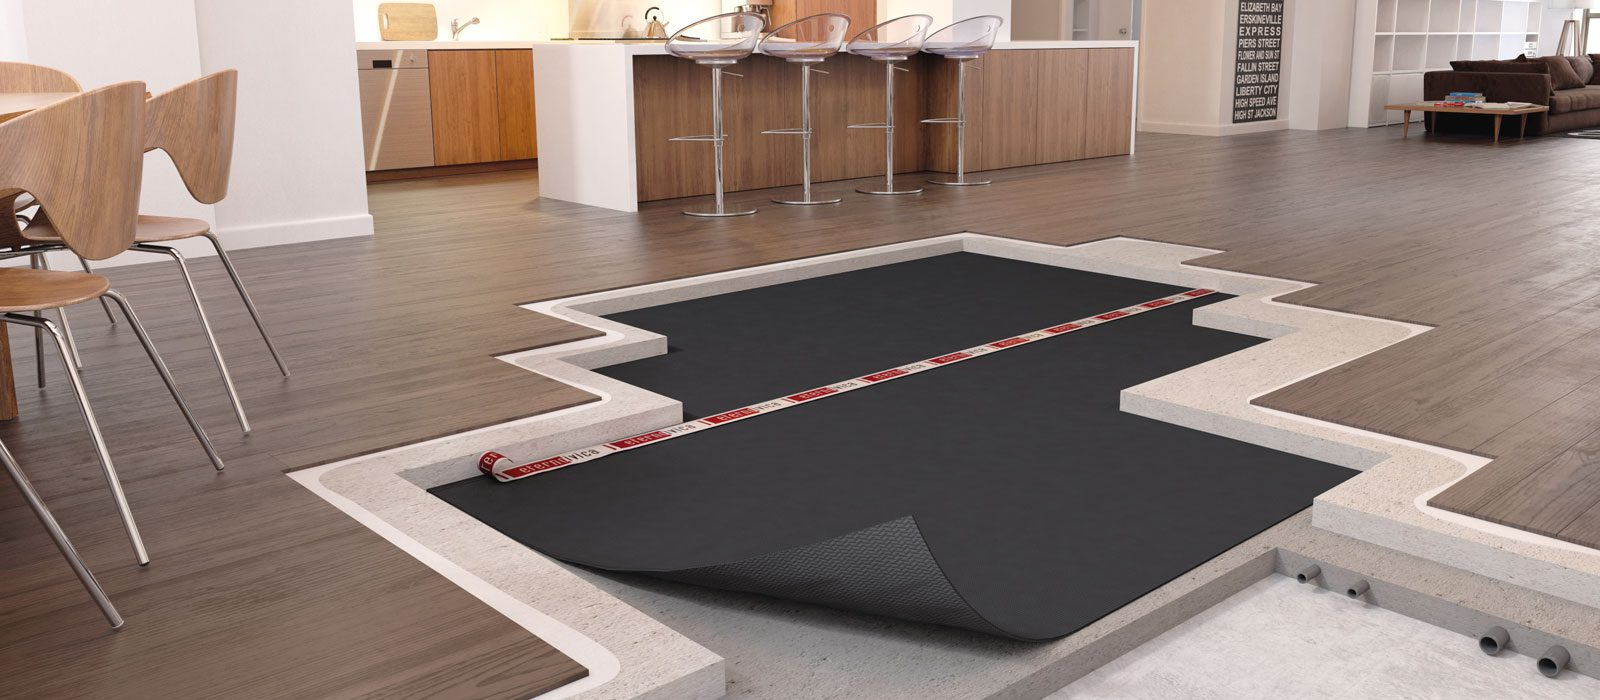 calpestio acustica pavimento galleggiante rumori impatto